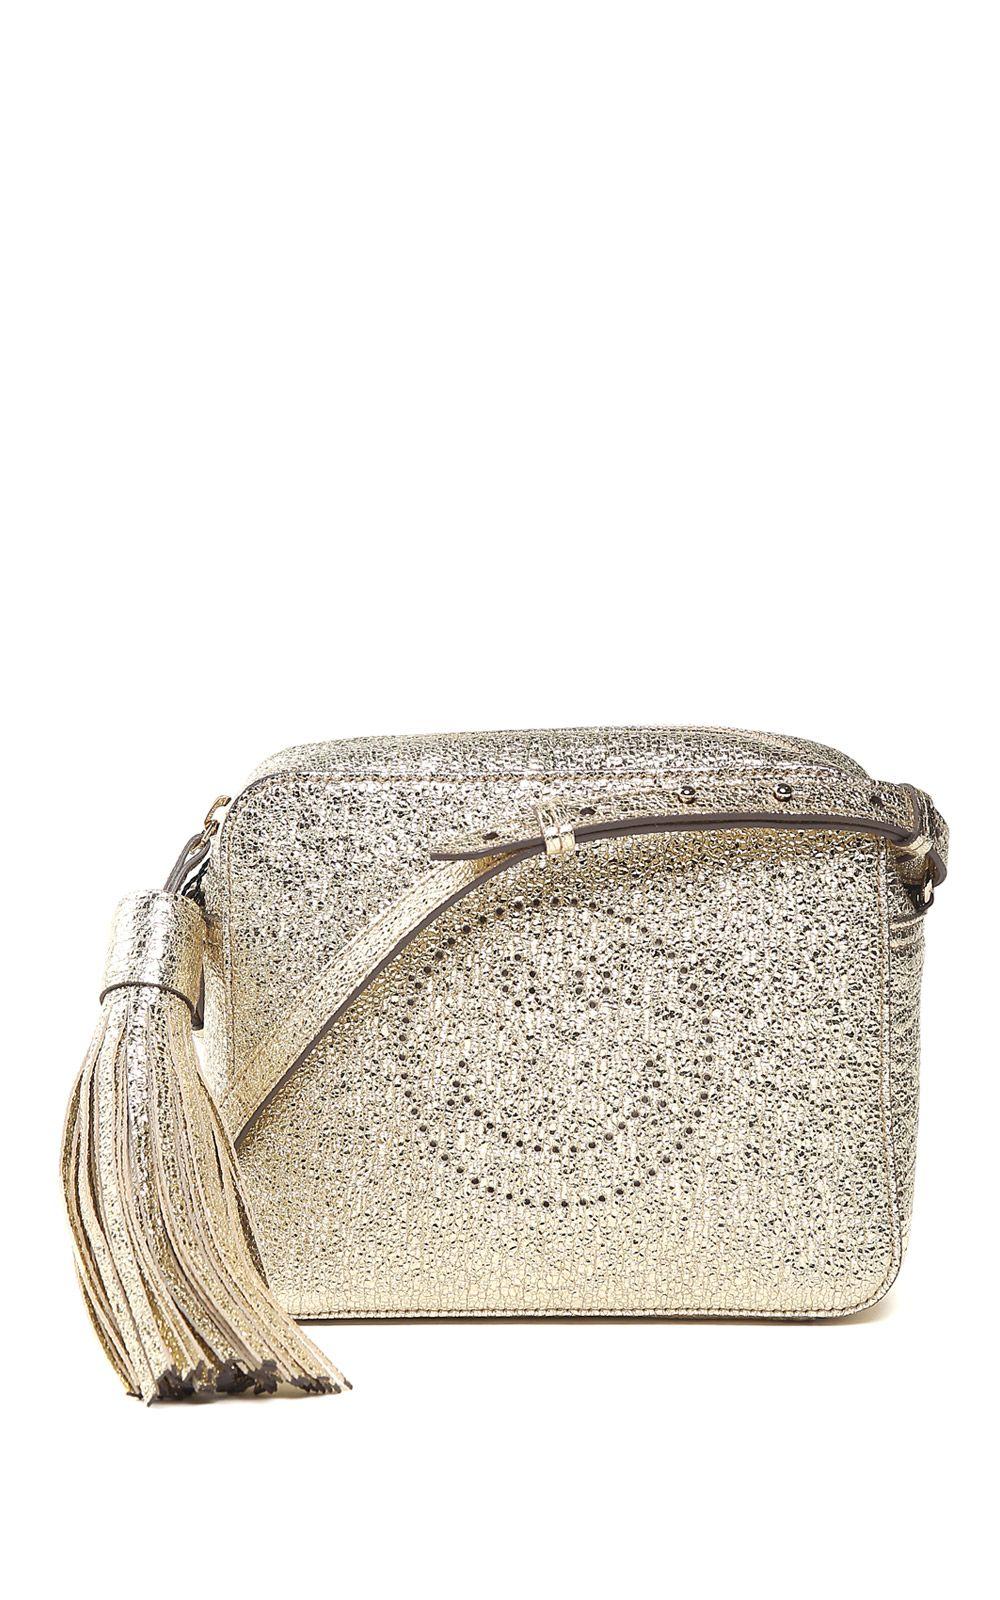 Anya Hindmarch Smiley Crinkled Metallic-leather Cross-body Bag